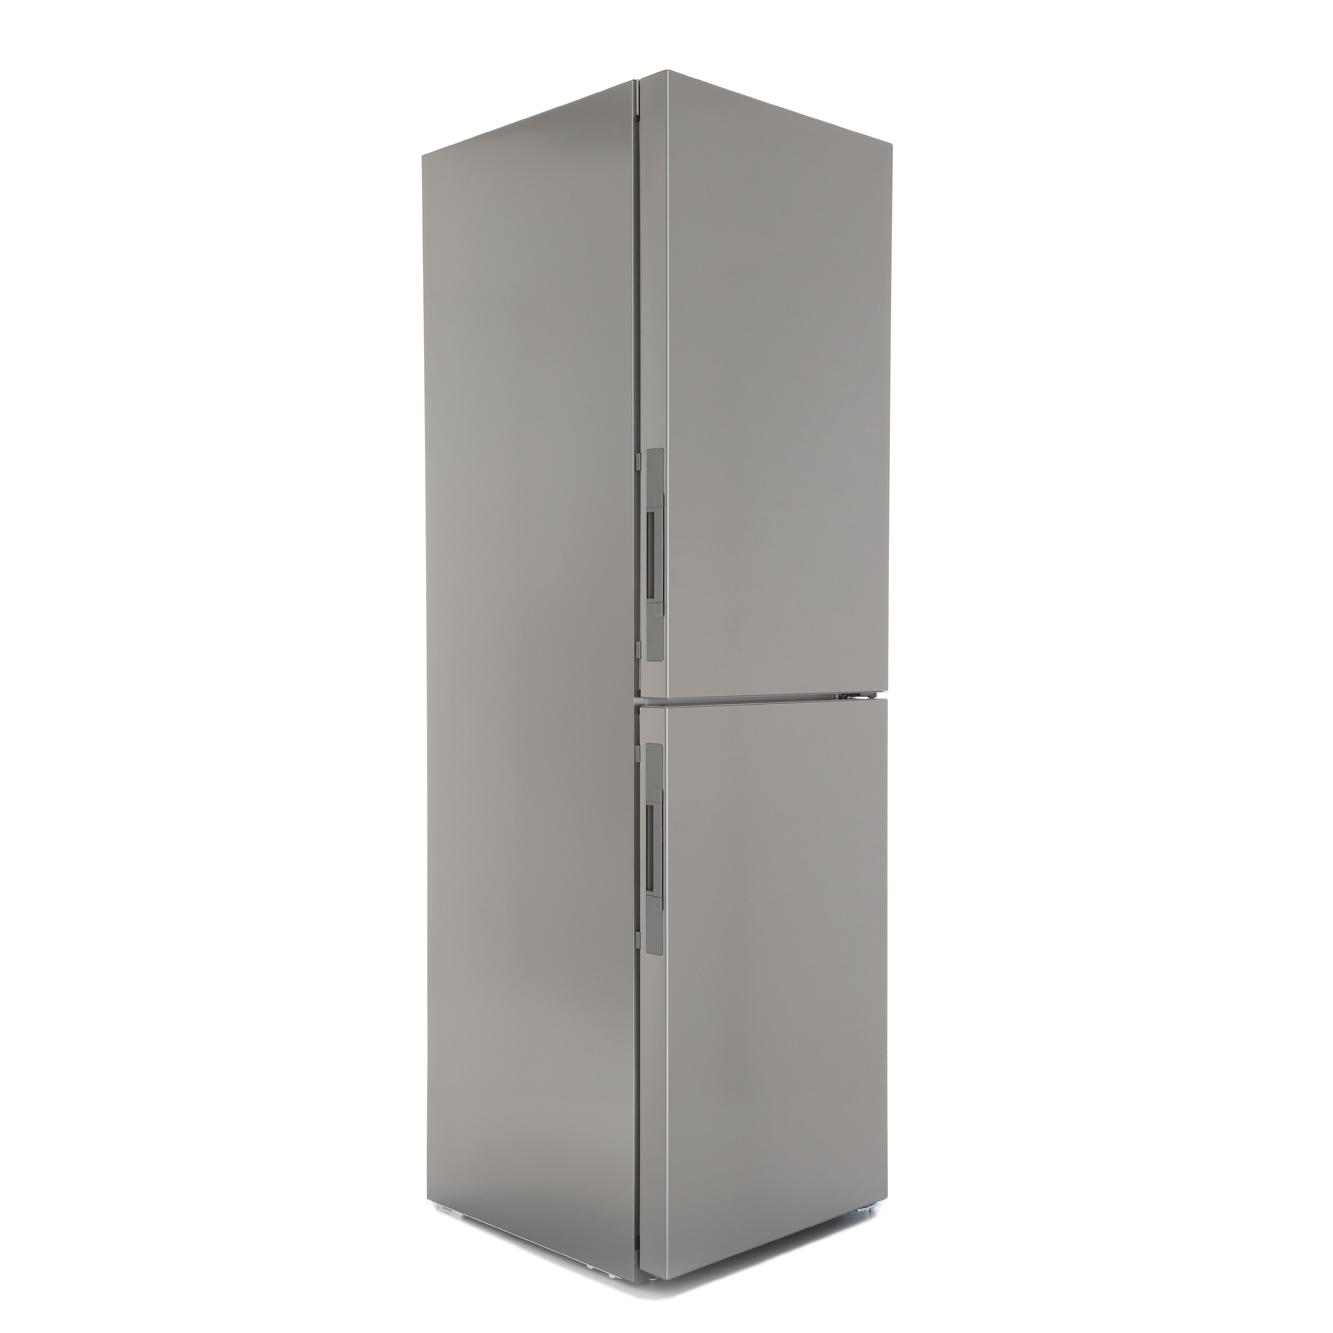 Miele KFN29243D Stainless Steel Fridge Freezer